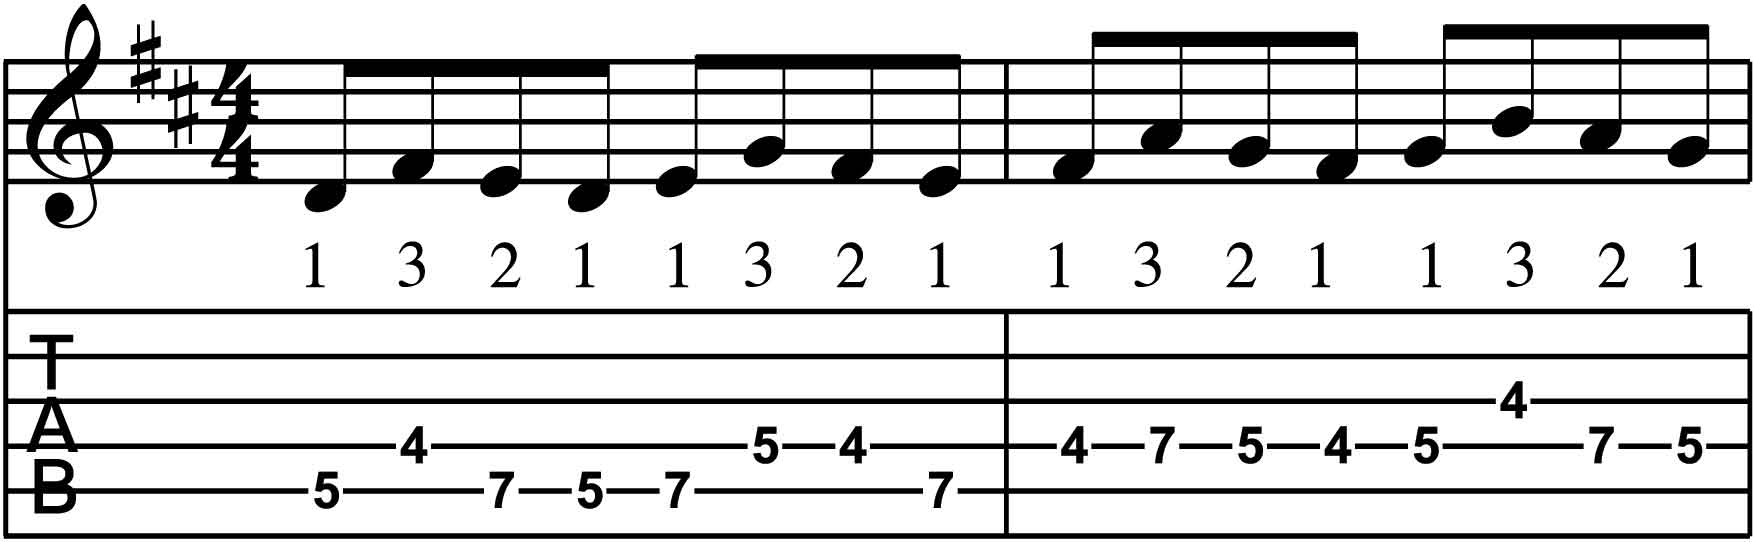 Patron guitarra 1321 escala mayor